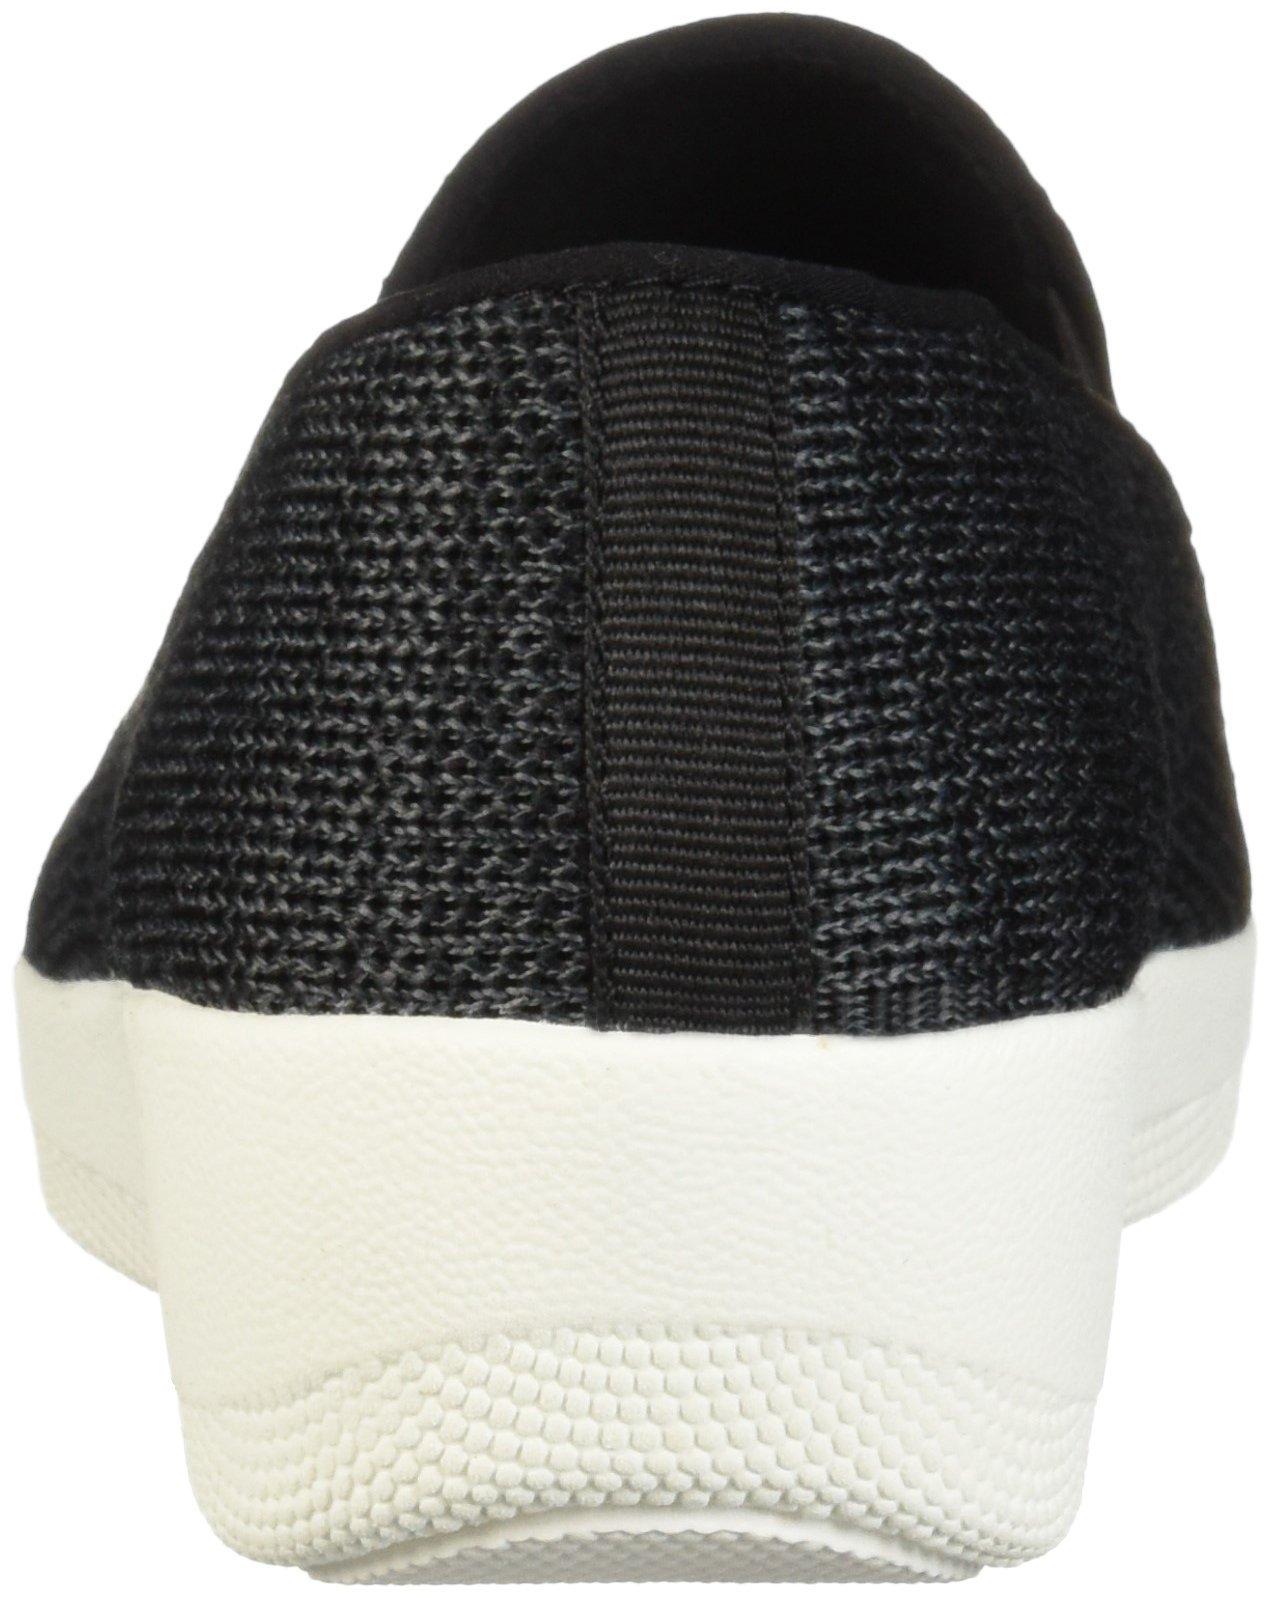 FitFlop Women's Superskate Uberknit Loafers, Black/Soft Grey, 8.5 M US by FitFlop (Image #2)